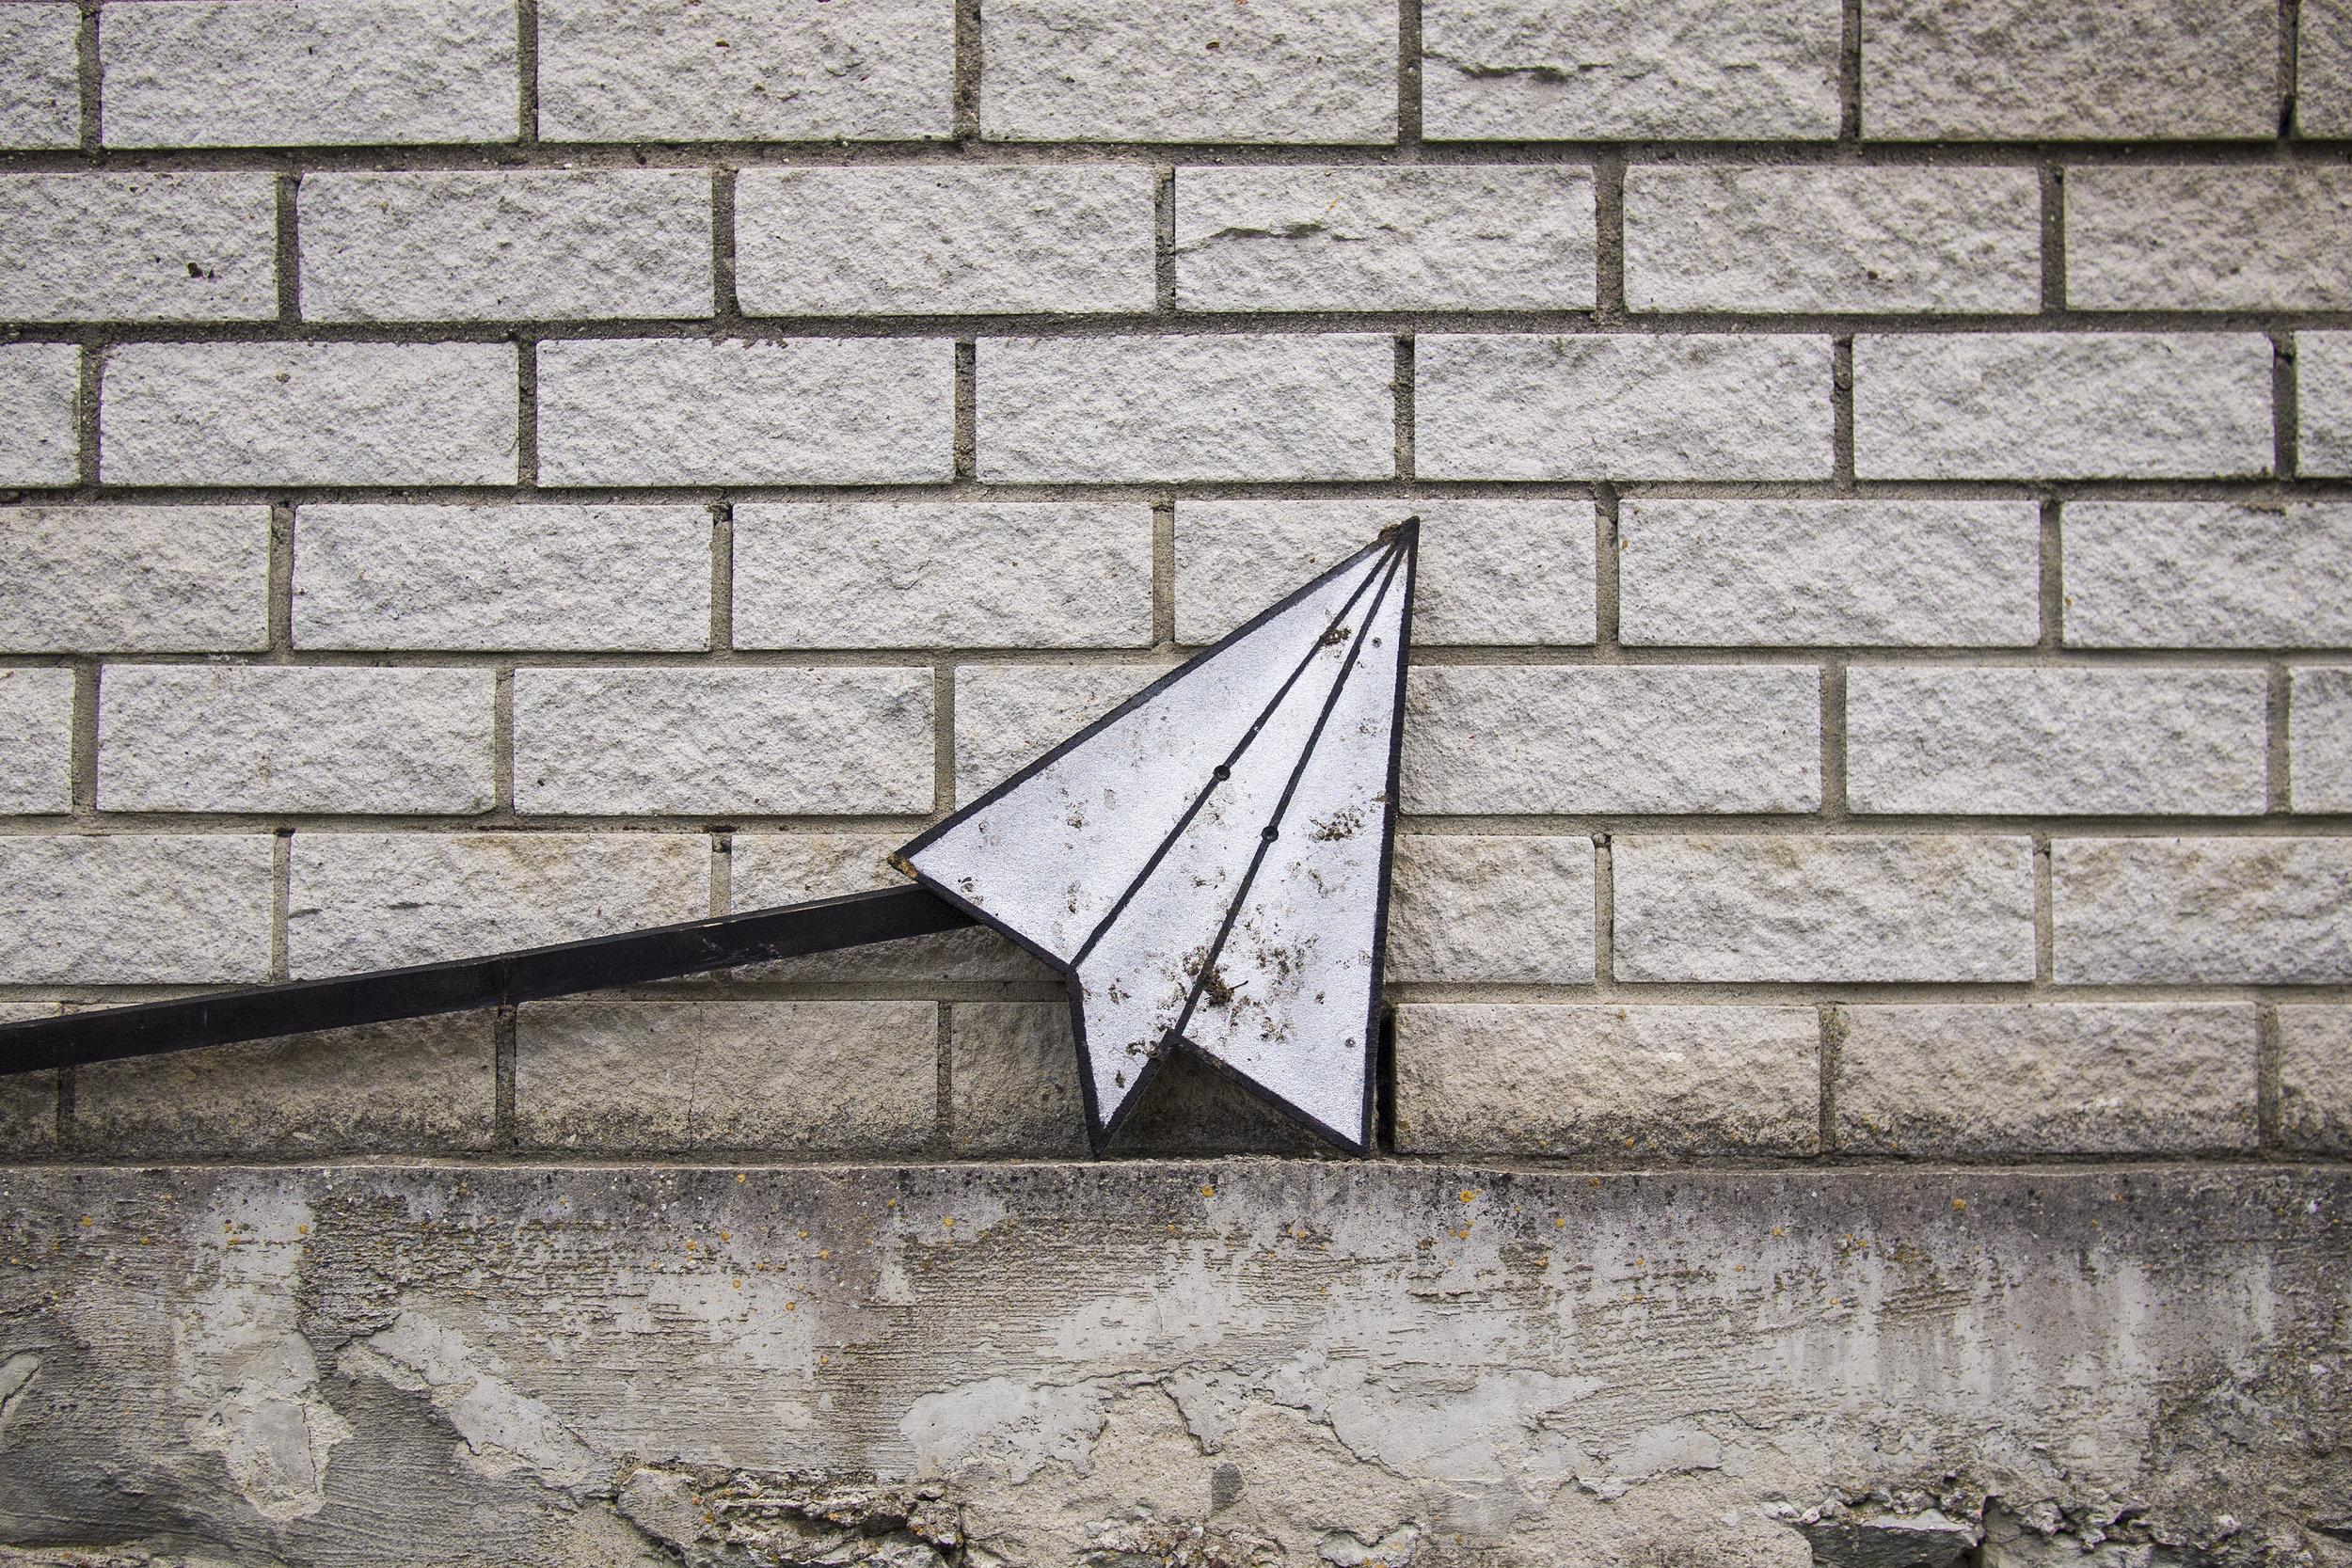 paper_aeroplane.jpg